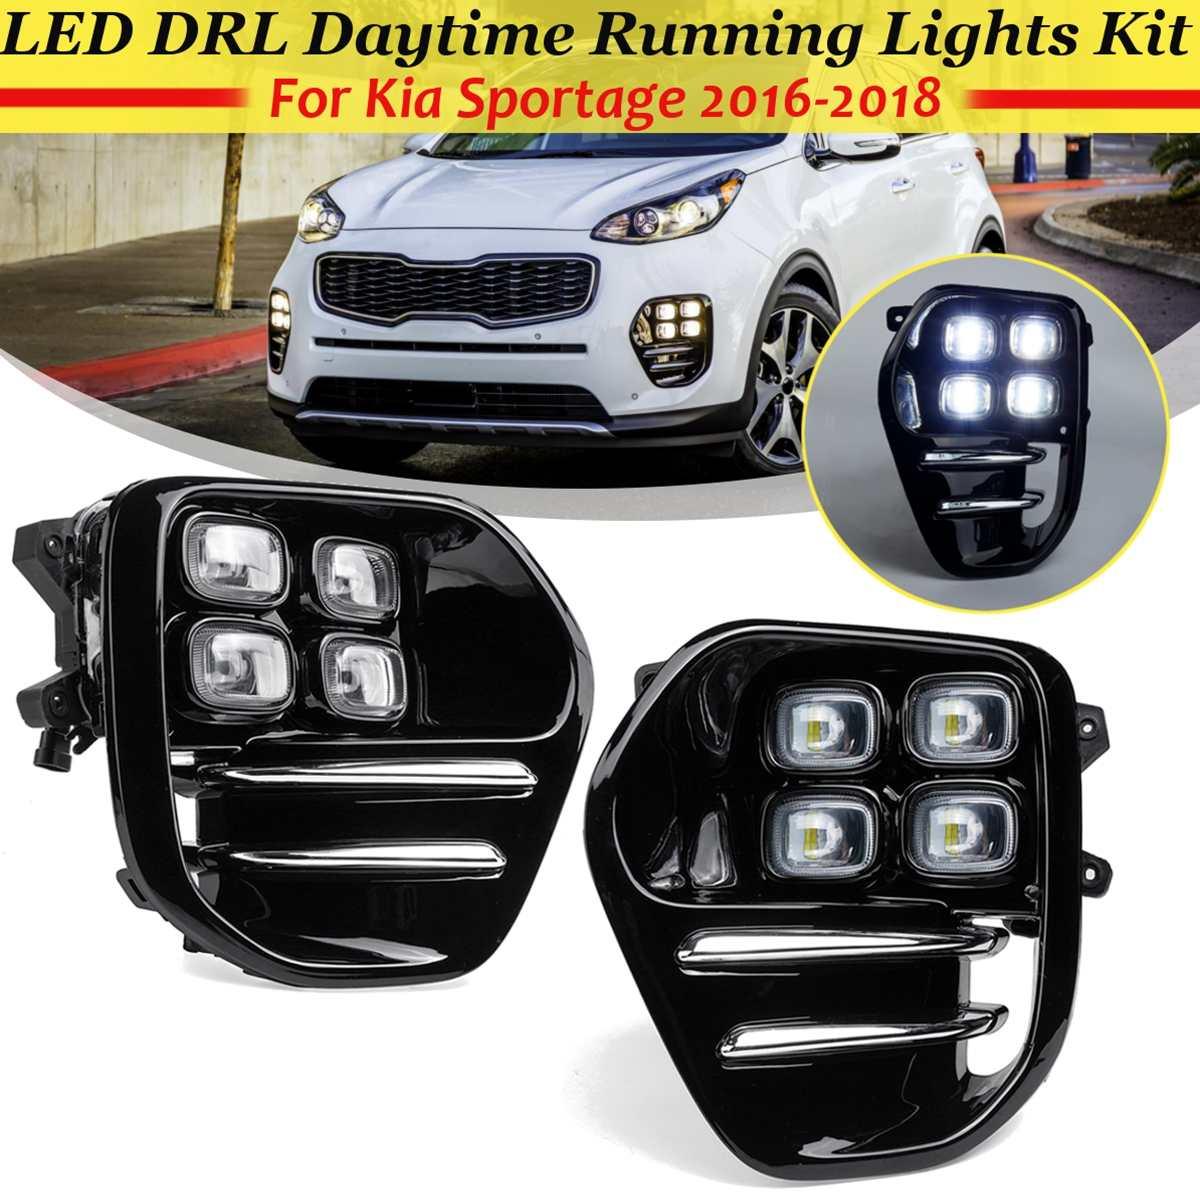 Par Car LED DRL Daytime Running Luz Com Enseada QL Grelha Para Kia Sportage 2016 2017 2018 Auto Condução Branco DRL Luz Styling